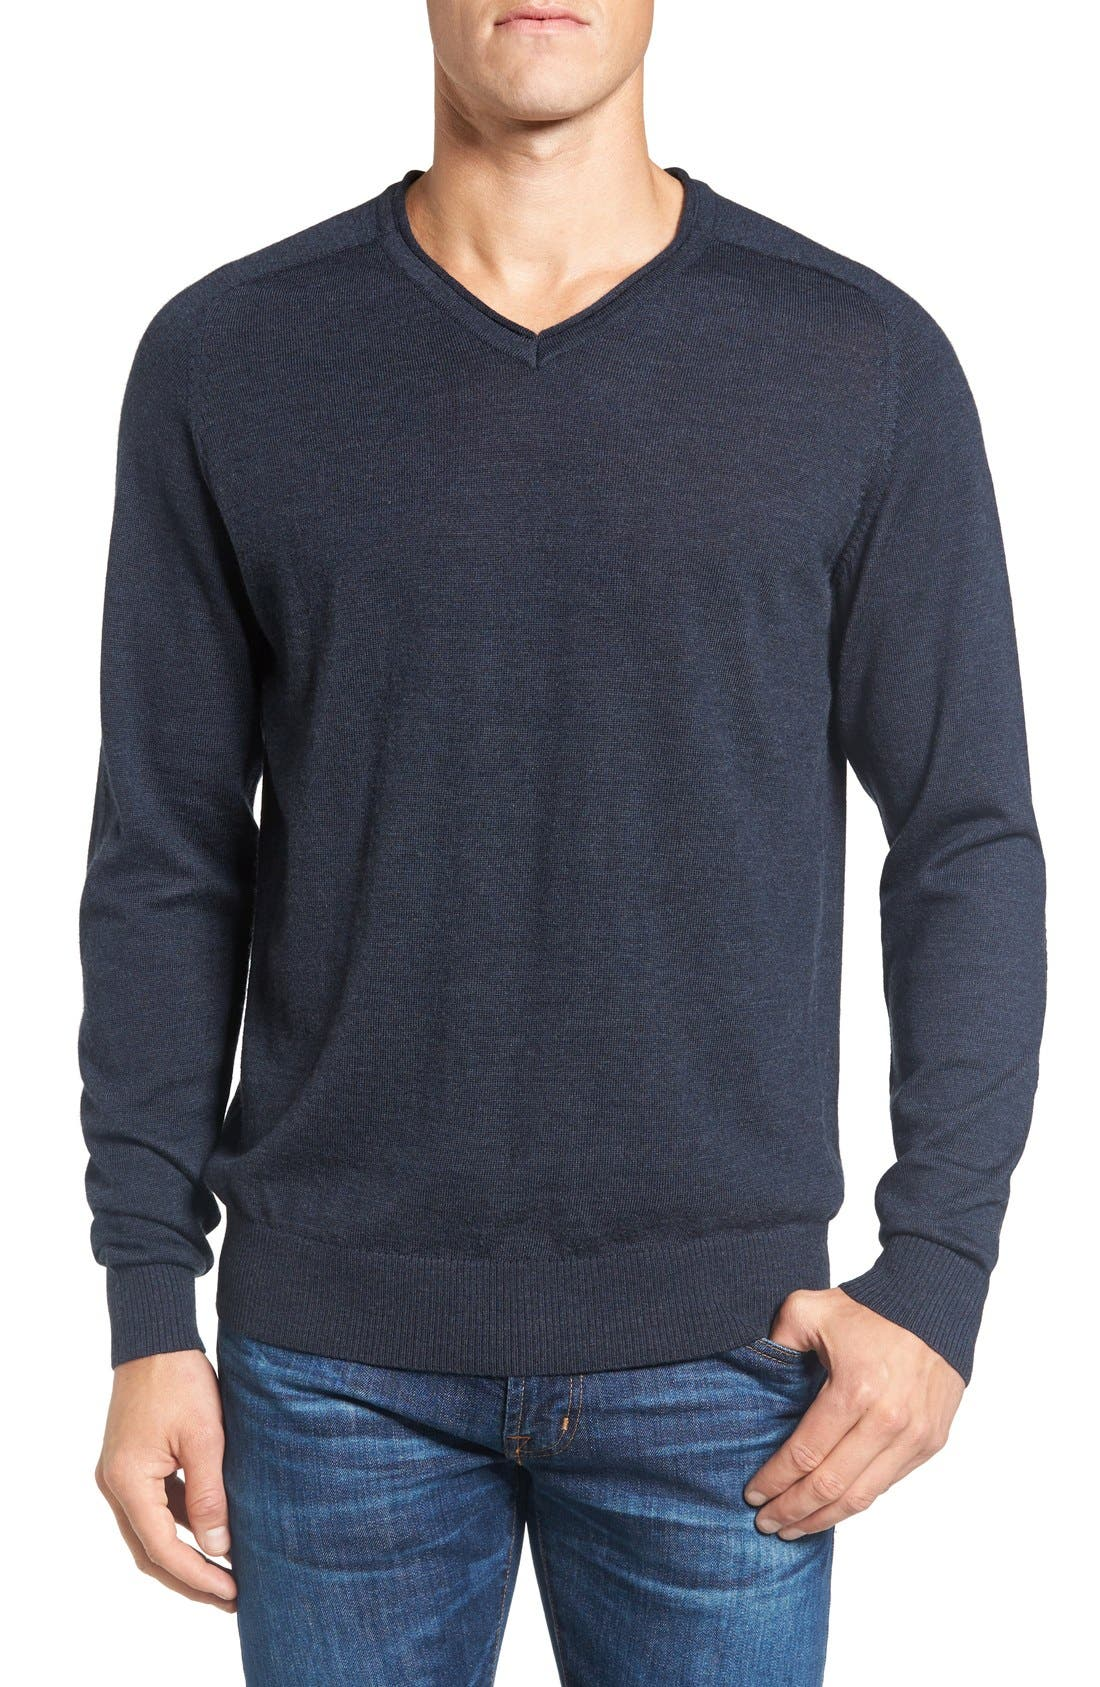 Rodd & Gunn 'Burwood Bay' Wool V-Neck Sweater